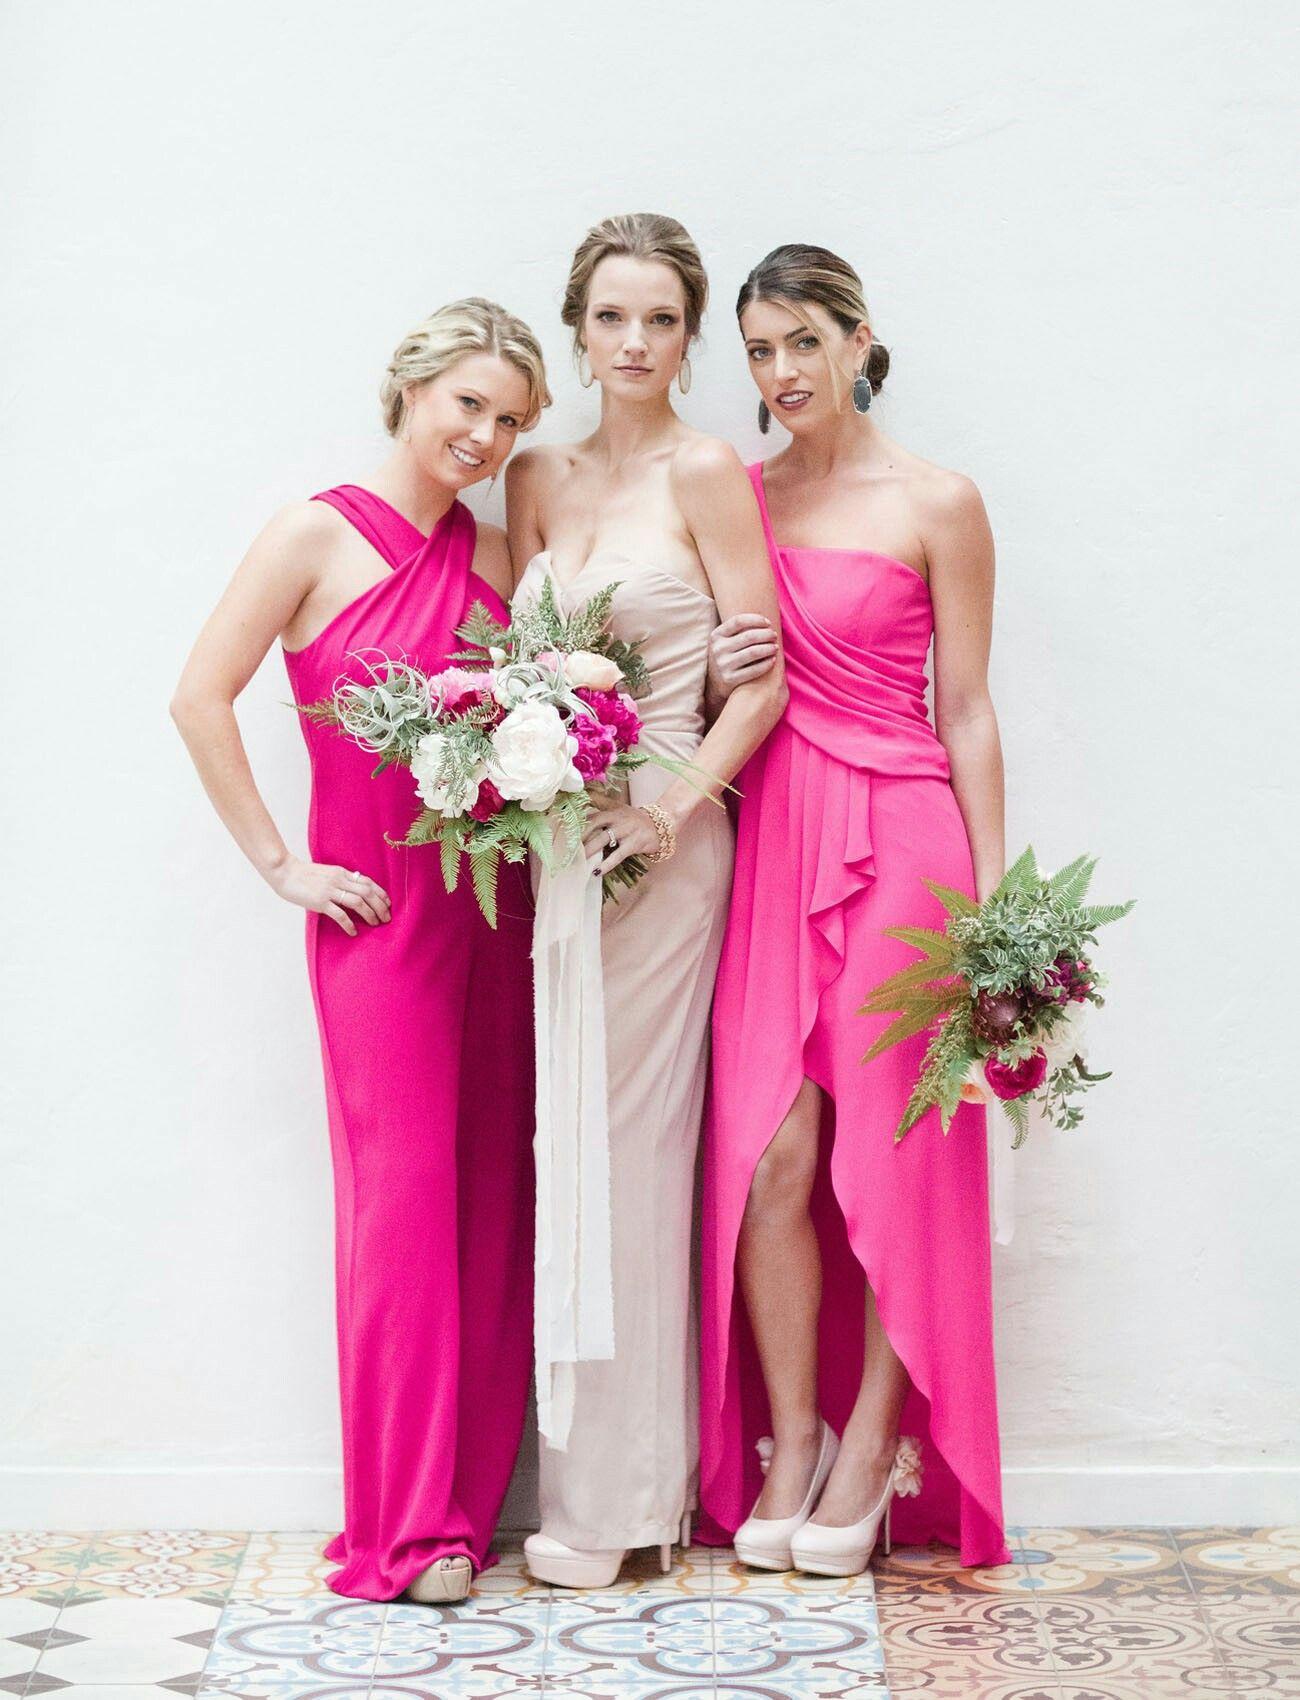 Pin de Kelly Judge en Bridesmaids   Pinterest